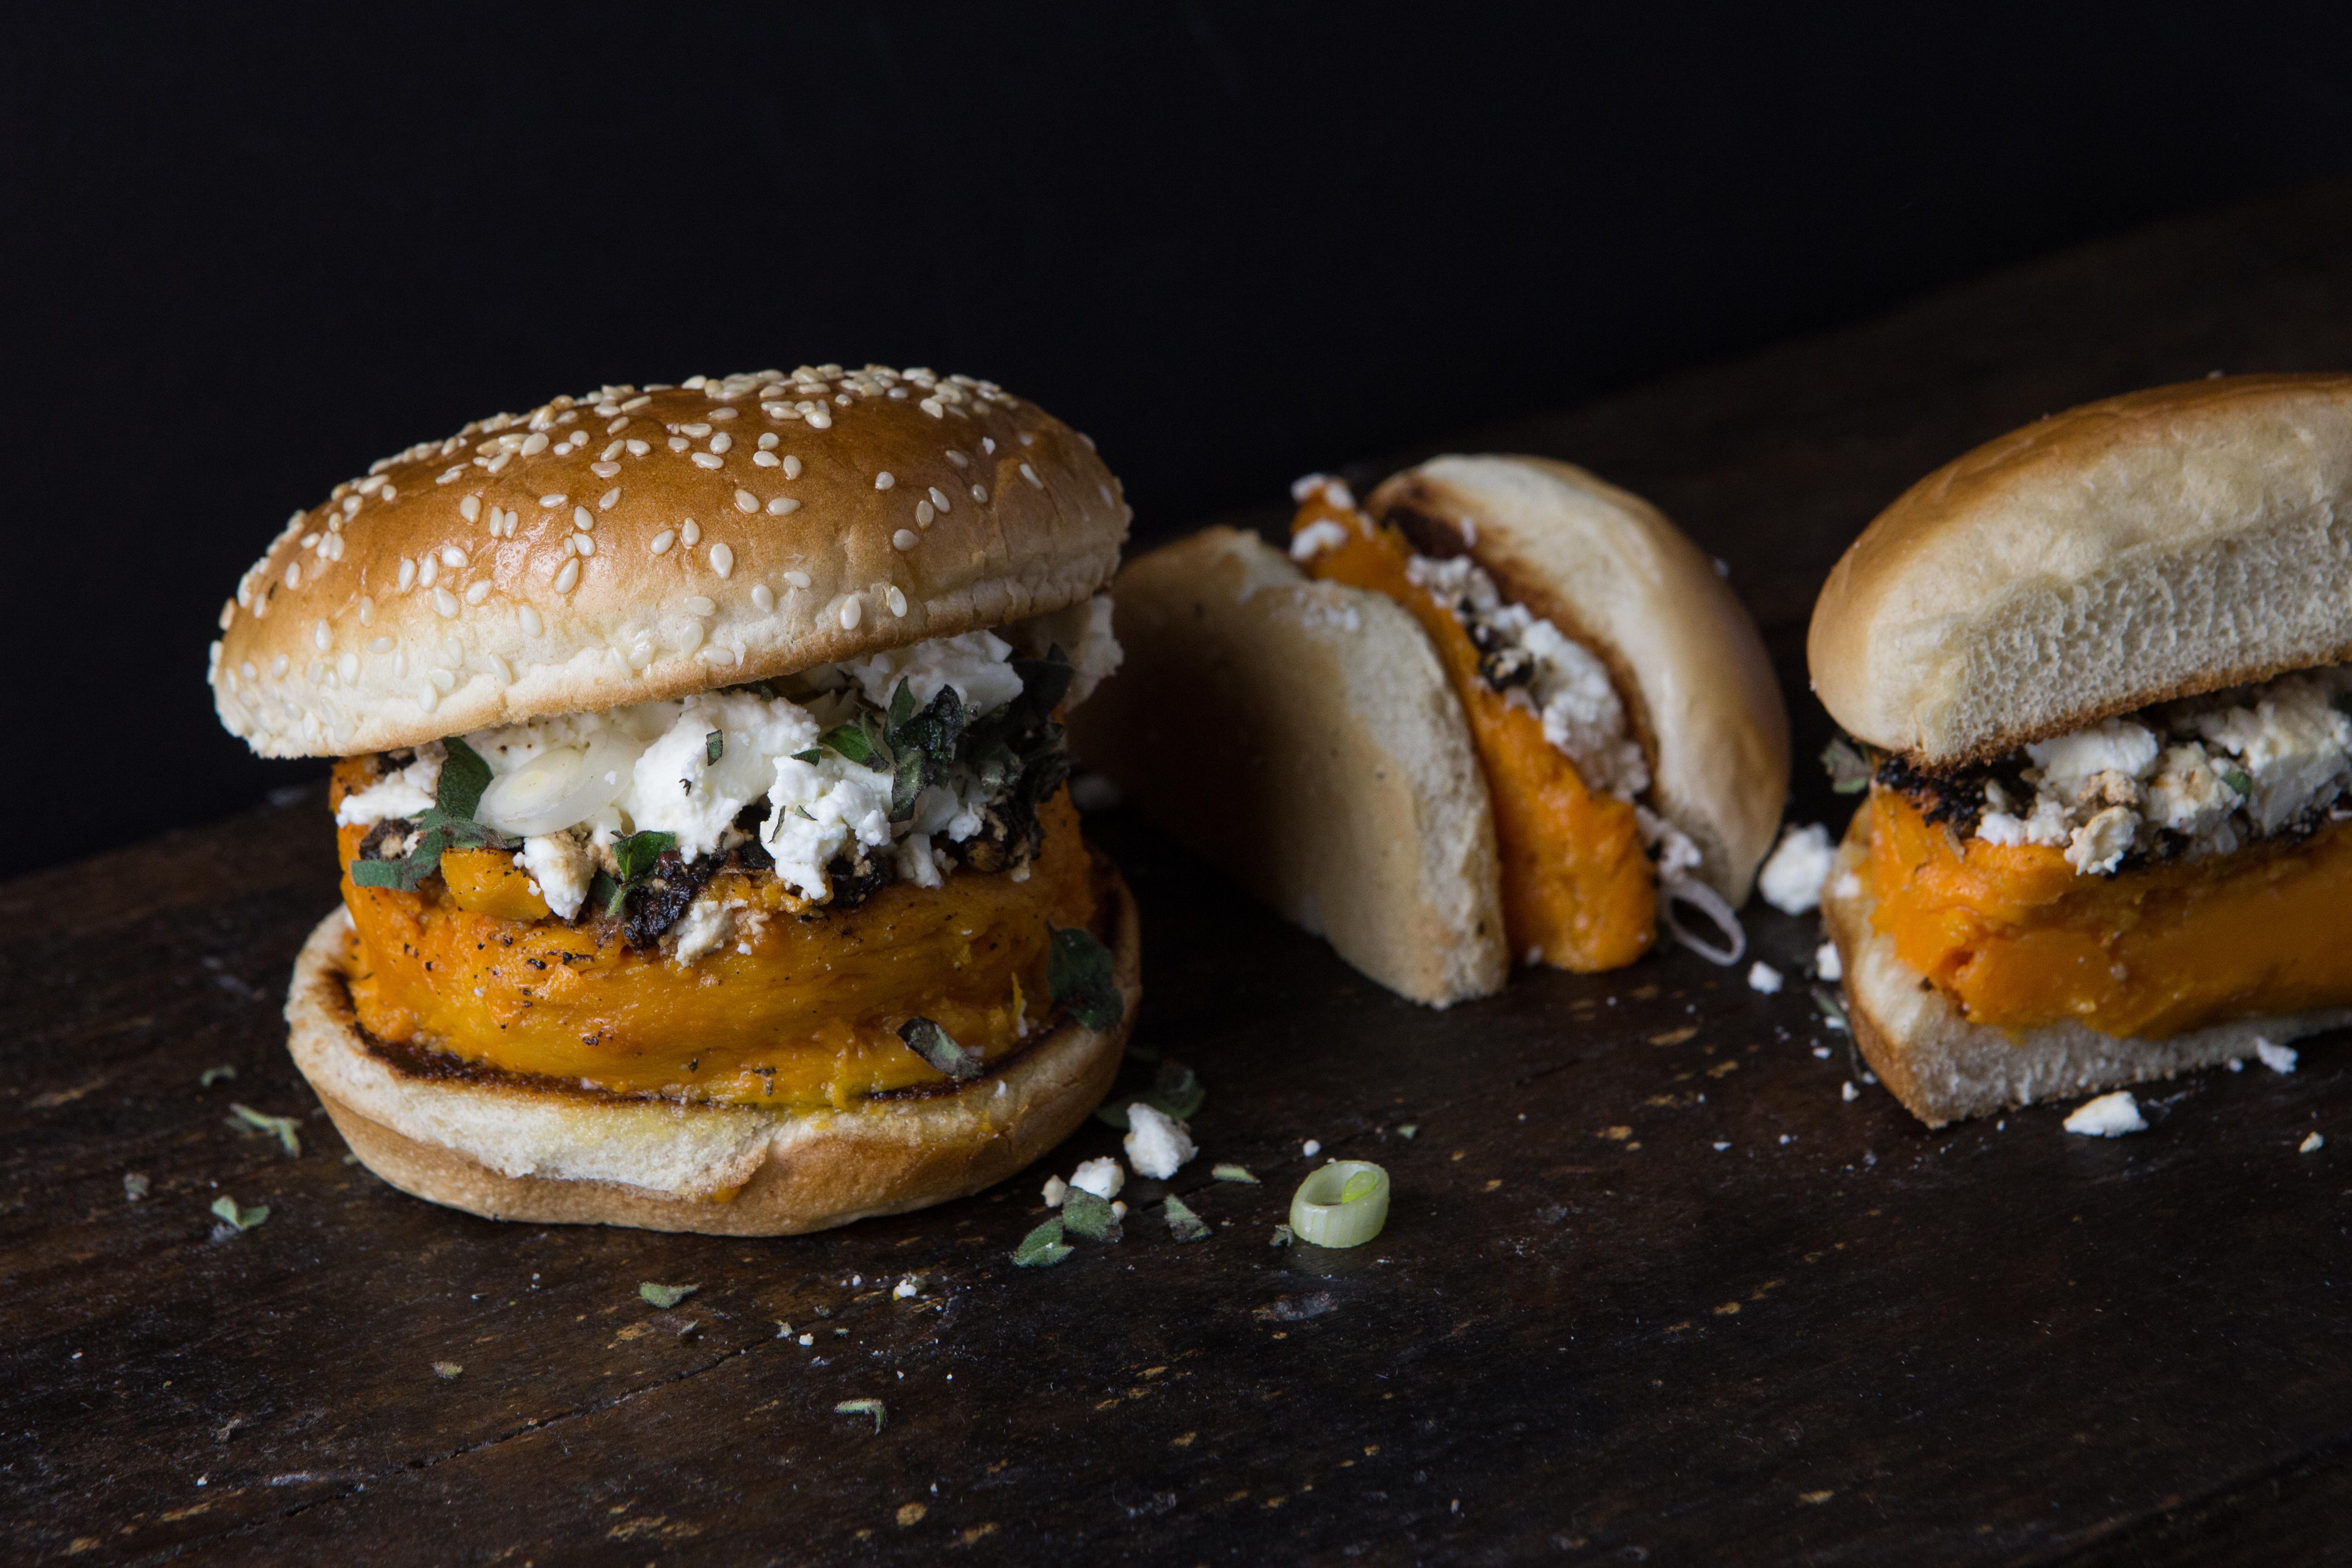 Una hamburguesa hecha a base de batata (Jennifer Chase / The Washington Post)